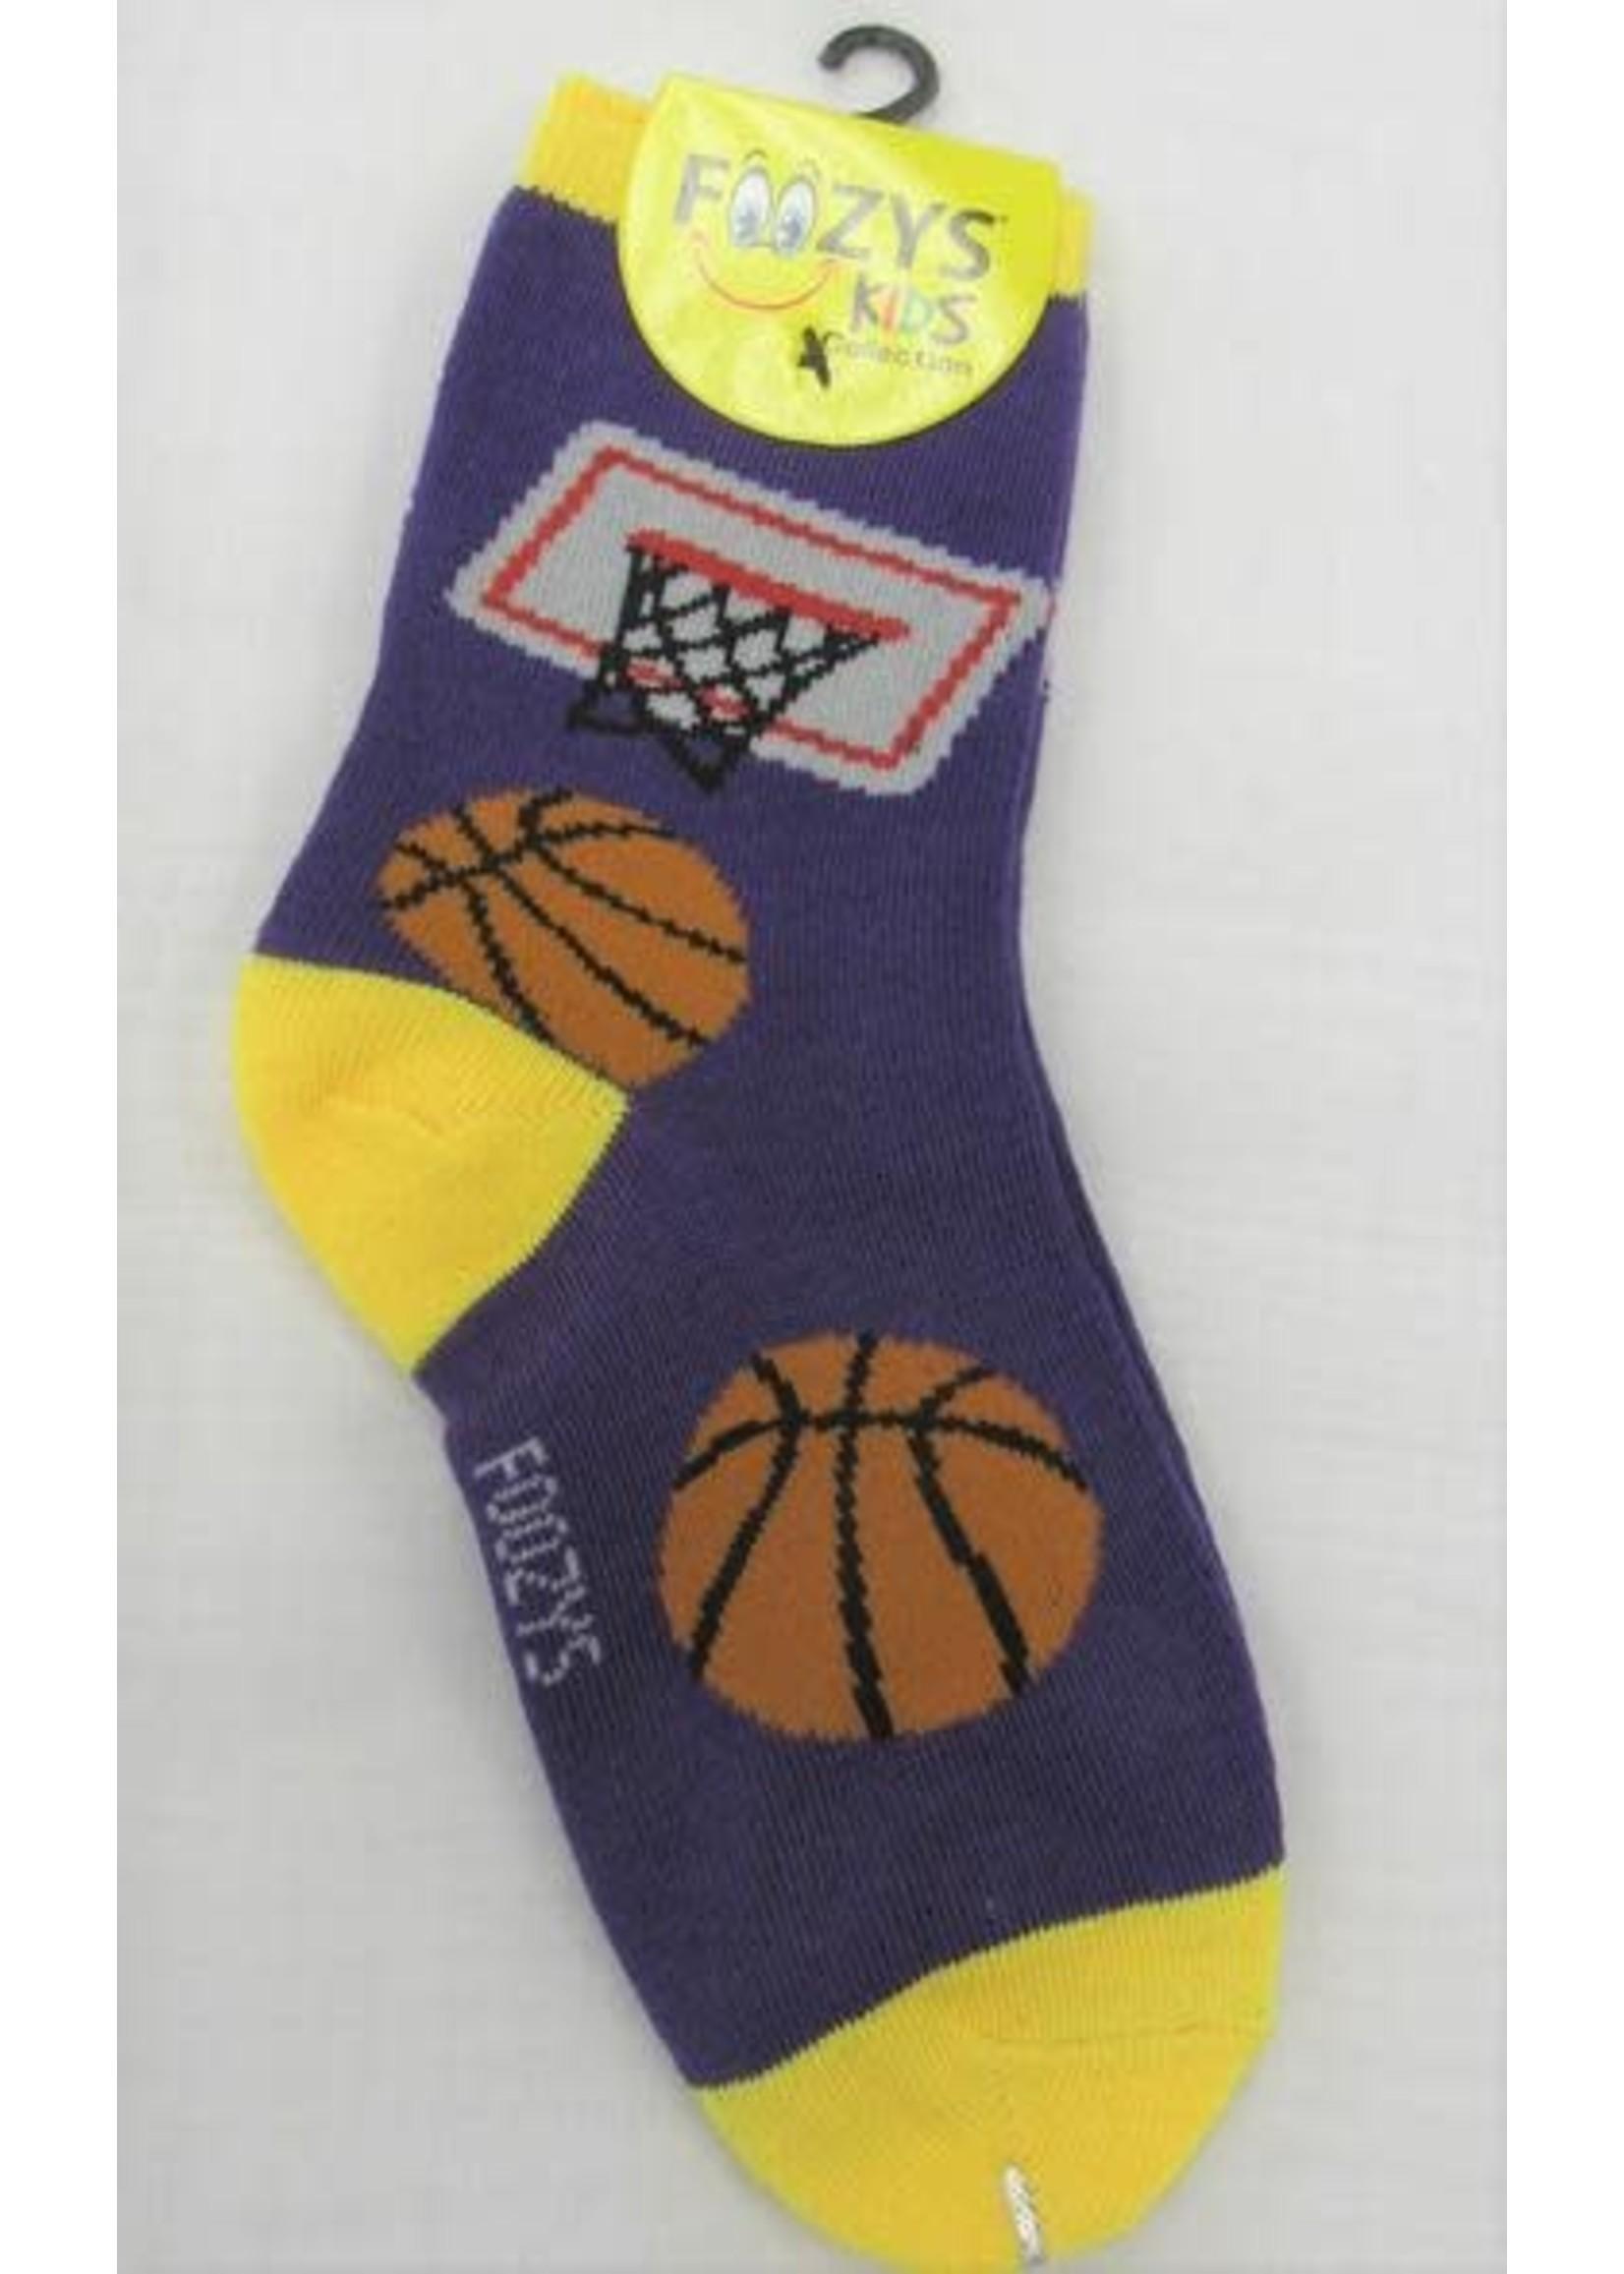 Foozys Basketball Socks